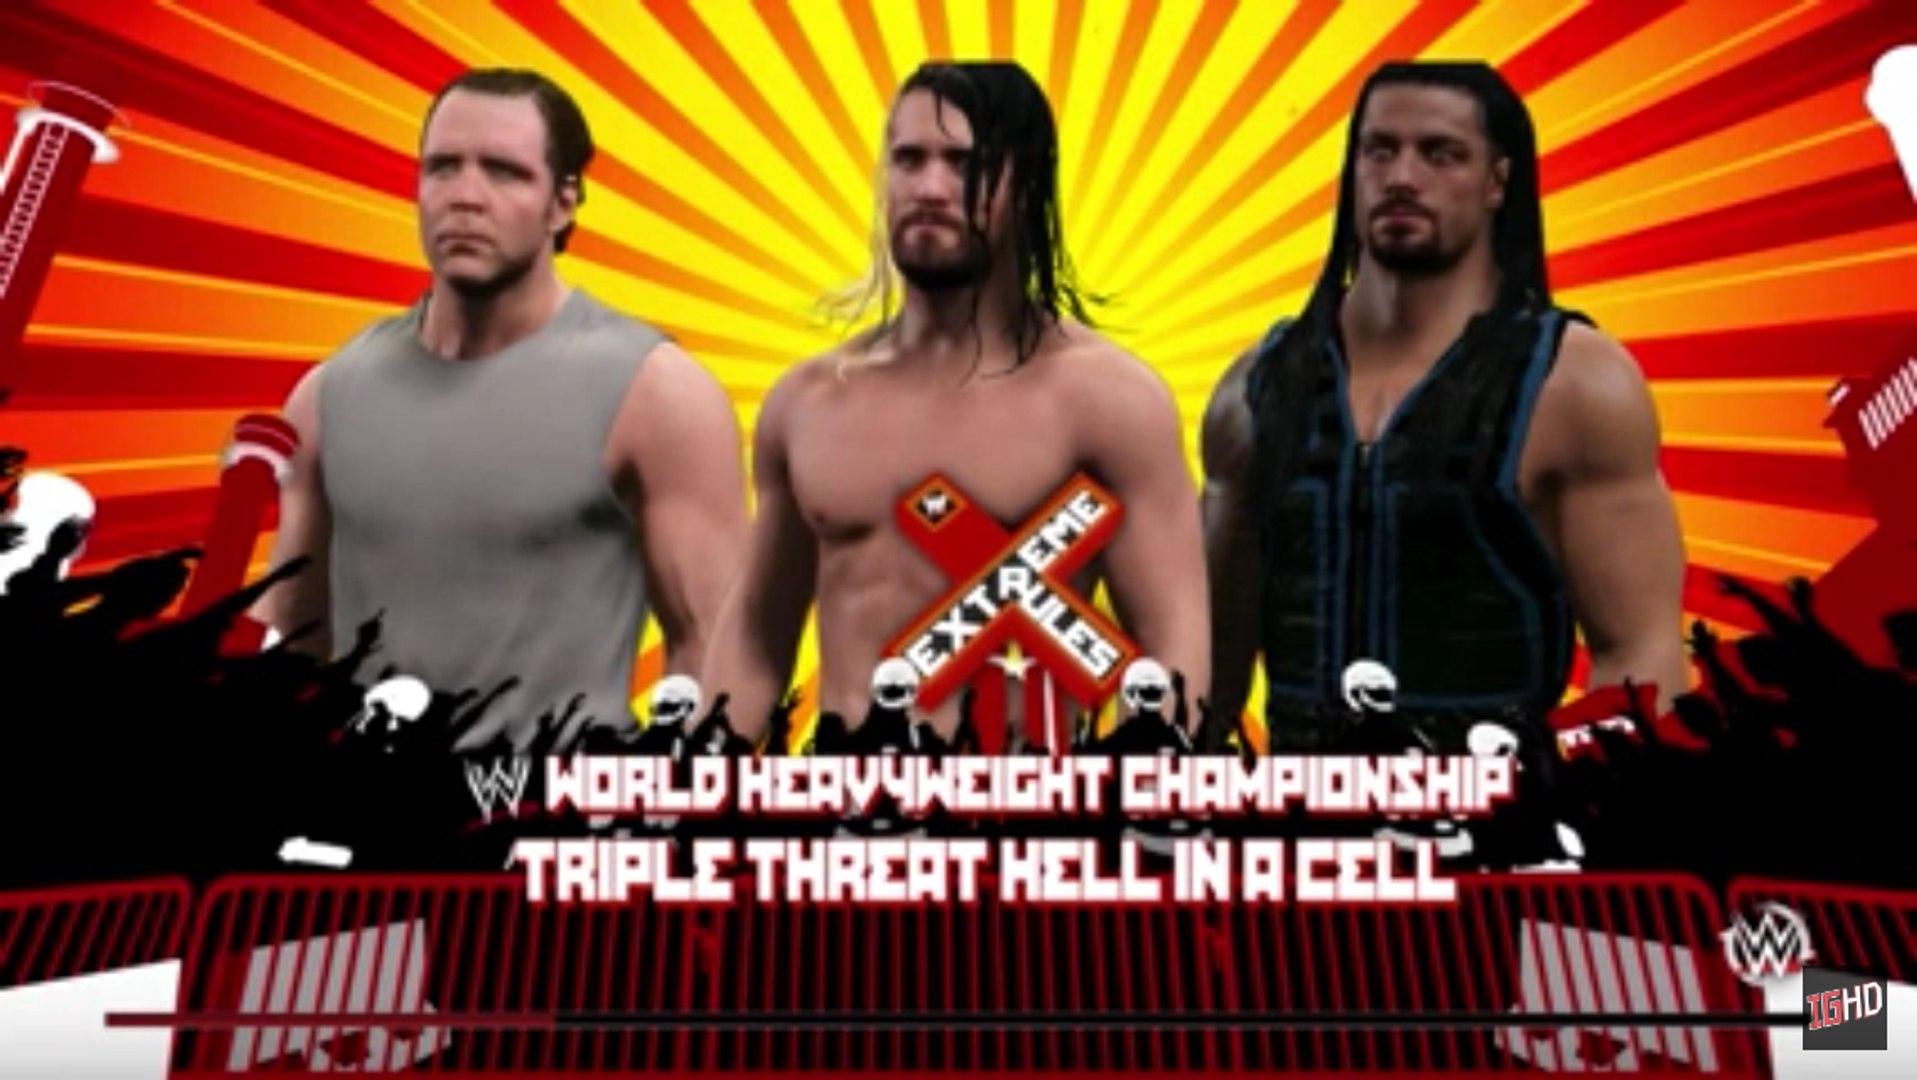 WWE 2K15 Dream Match - Dean Ambrose vs. Roman Reigns vs. Seth Rollins | WWE Extreme Rules | WWE 2K15